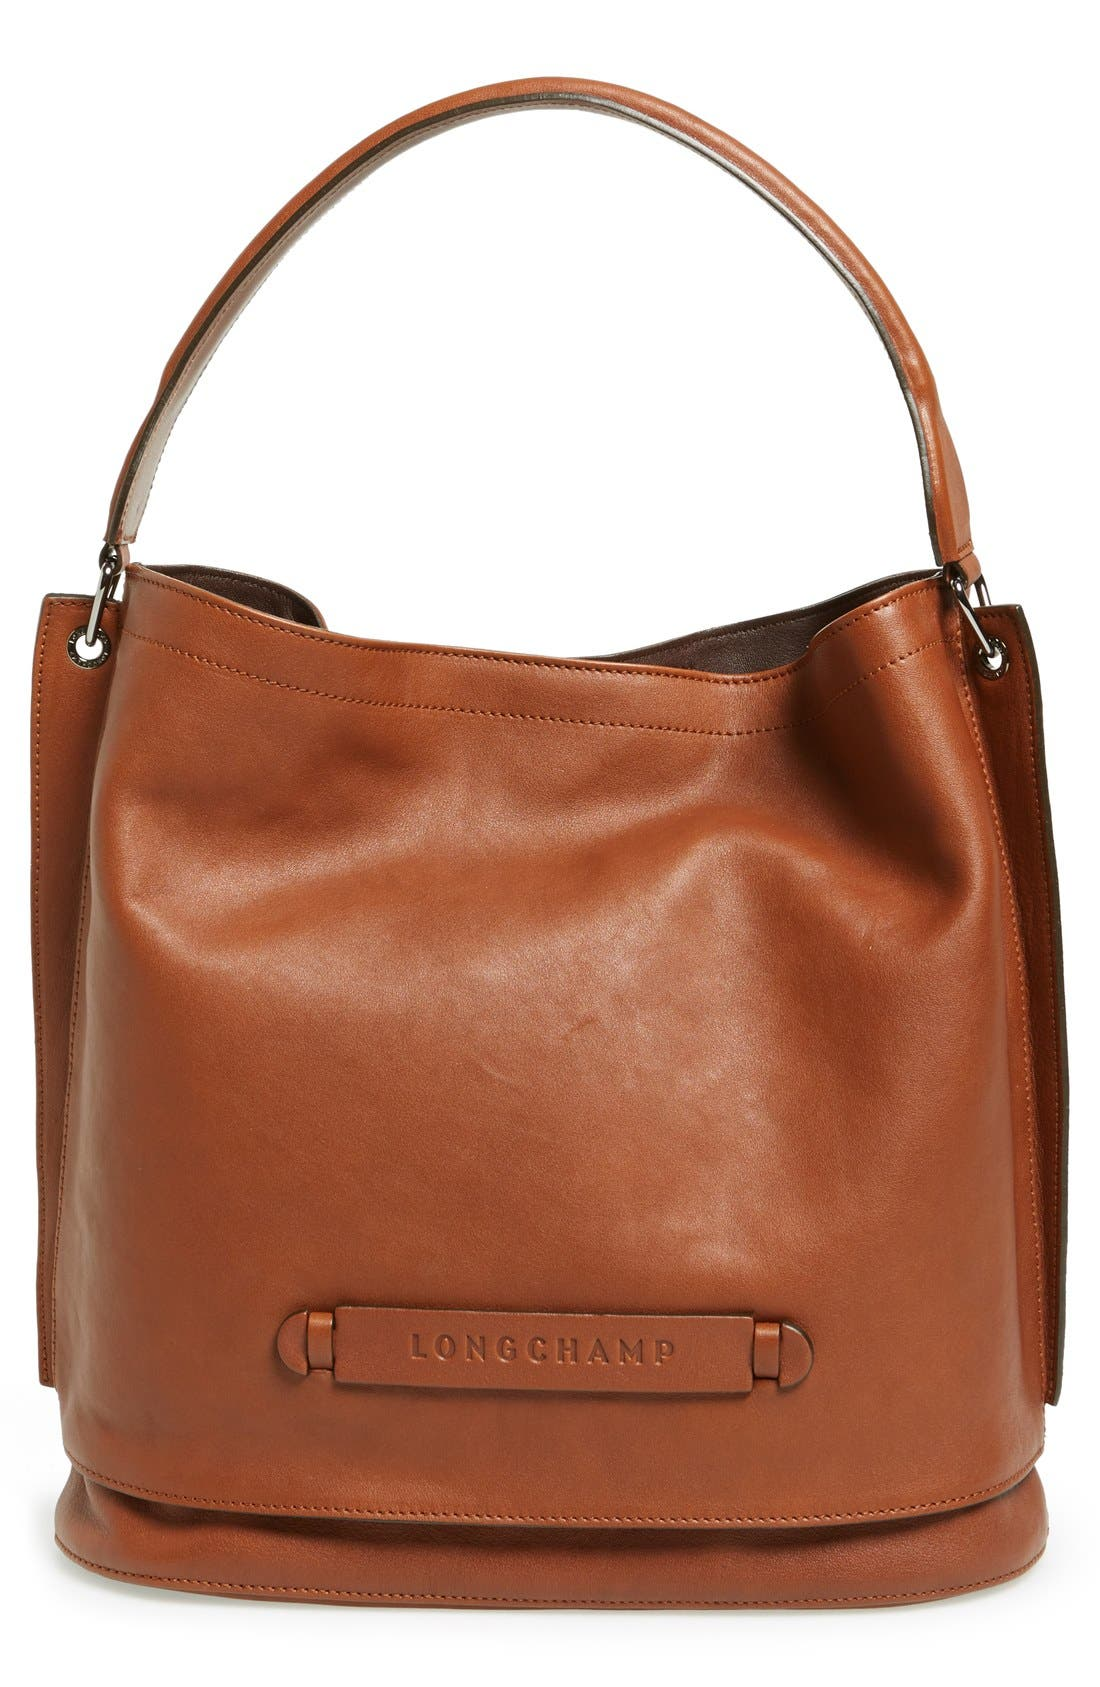 Main Image - Longchamp '3D' Leather Hobo